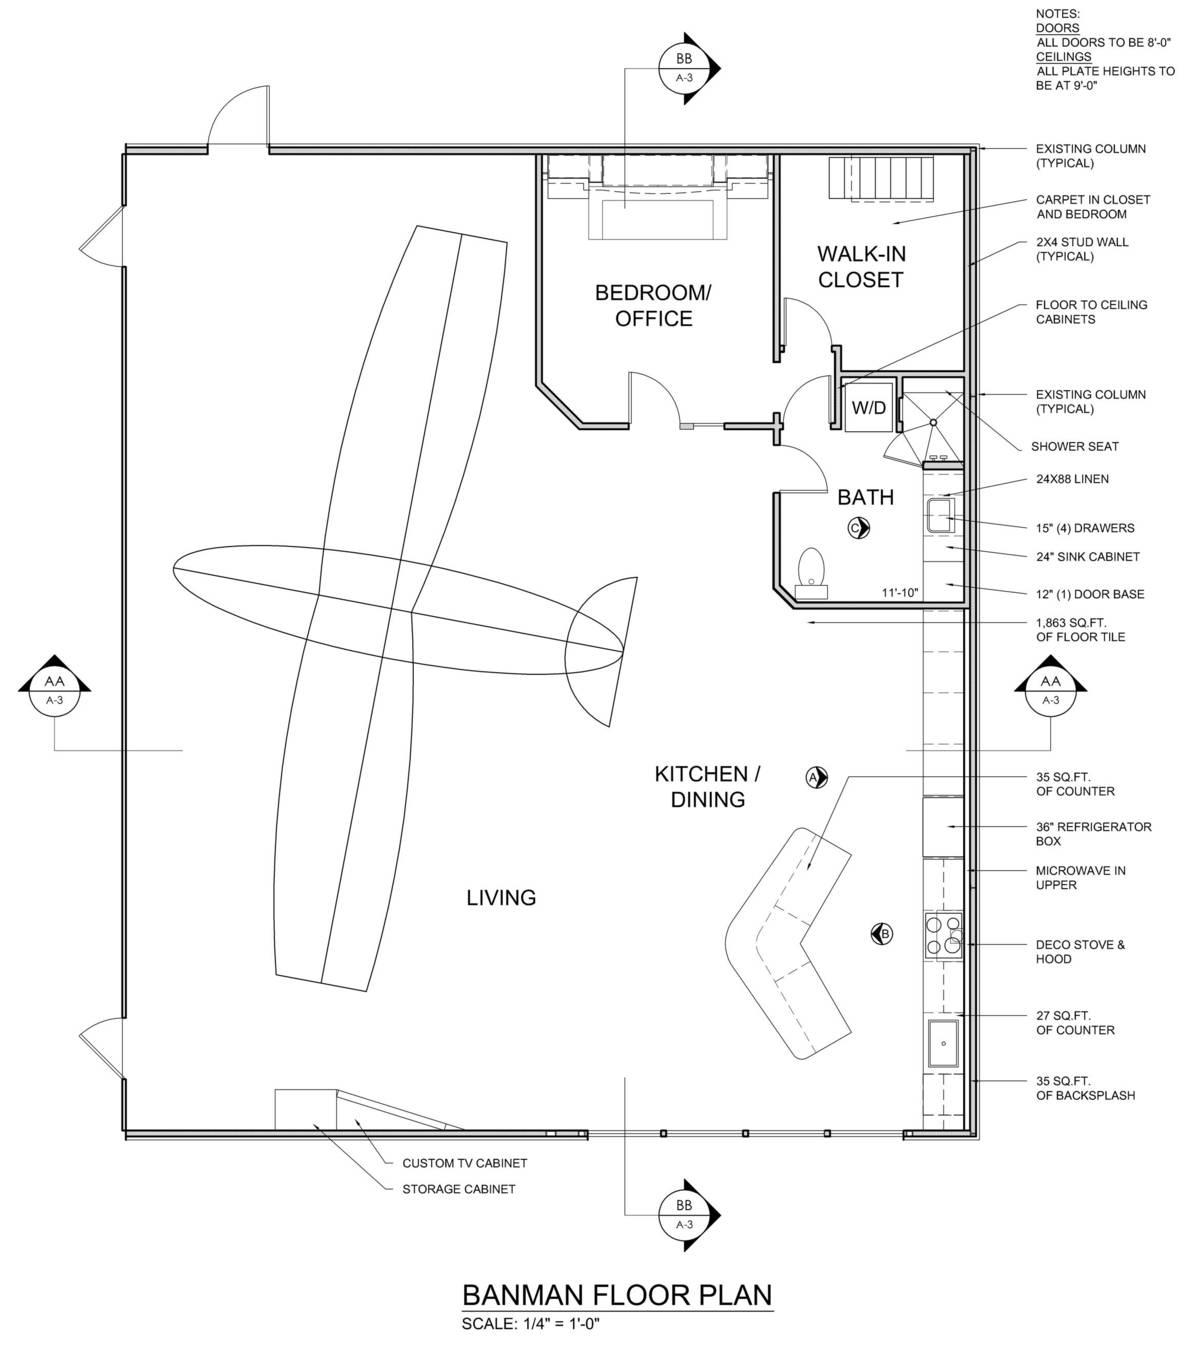 Banman live work airplane hangar james mcgarry archinect for Aircraft hangar home designs